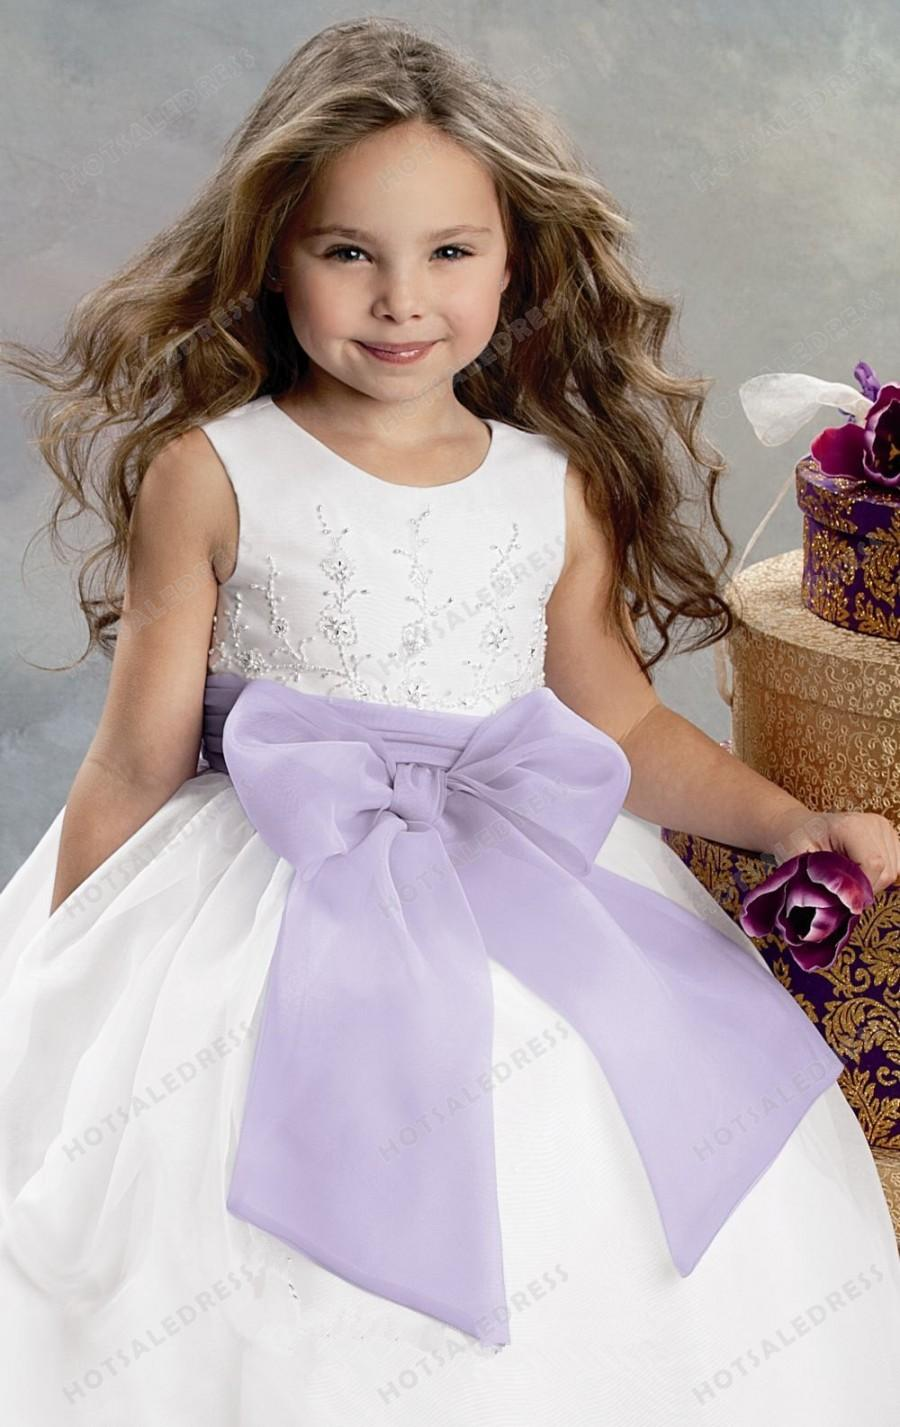 Wedding - Organza Scoop Neck Dress By Jordan Sweet Beginnings Collection L393